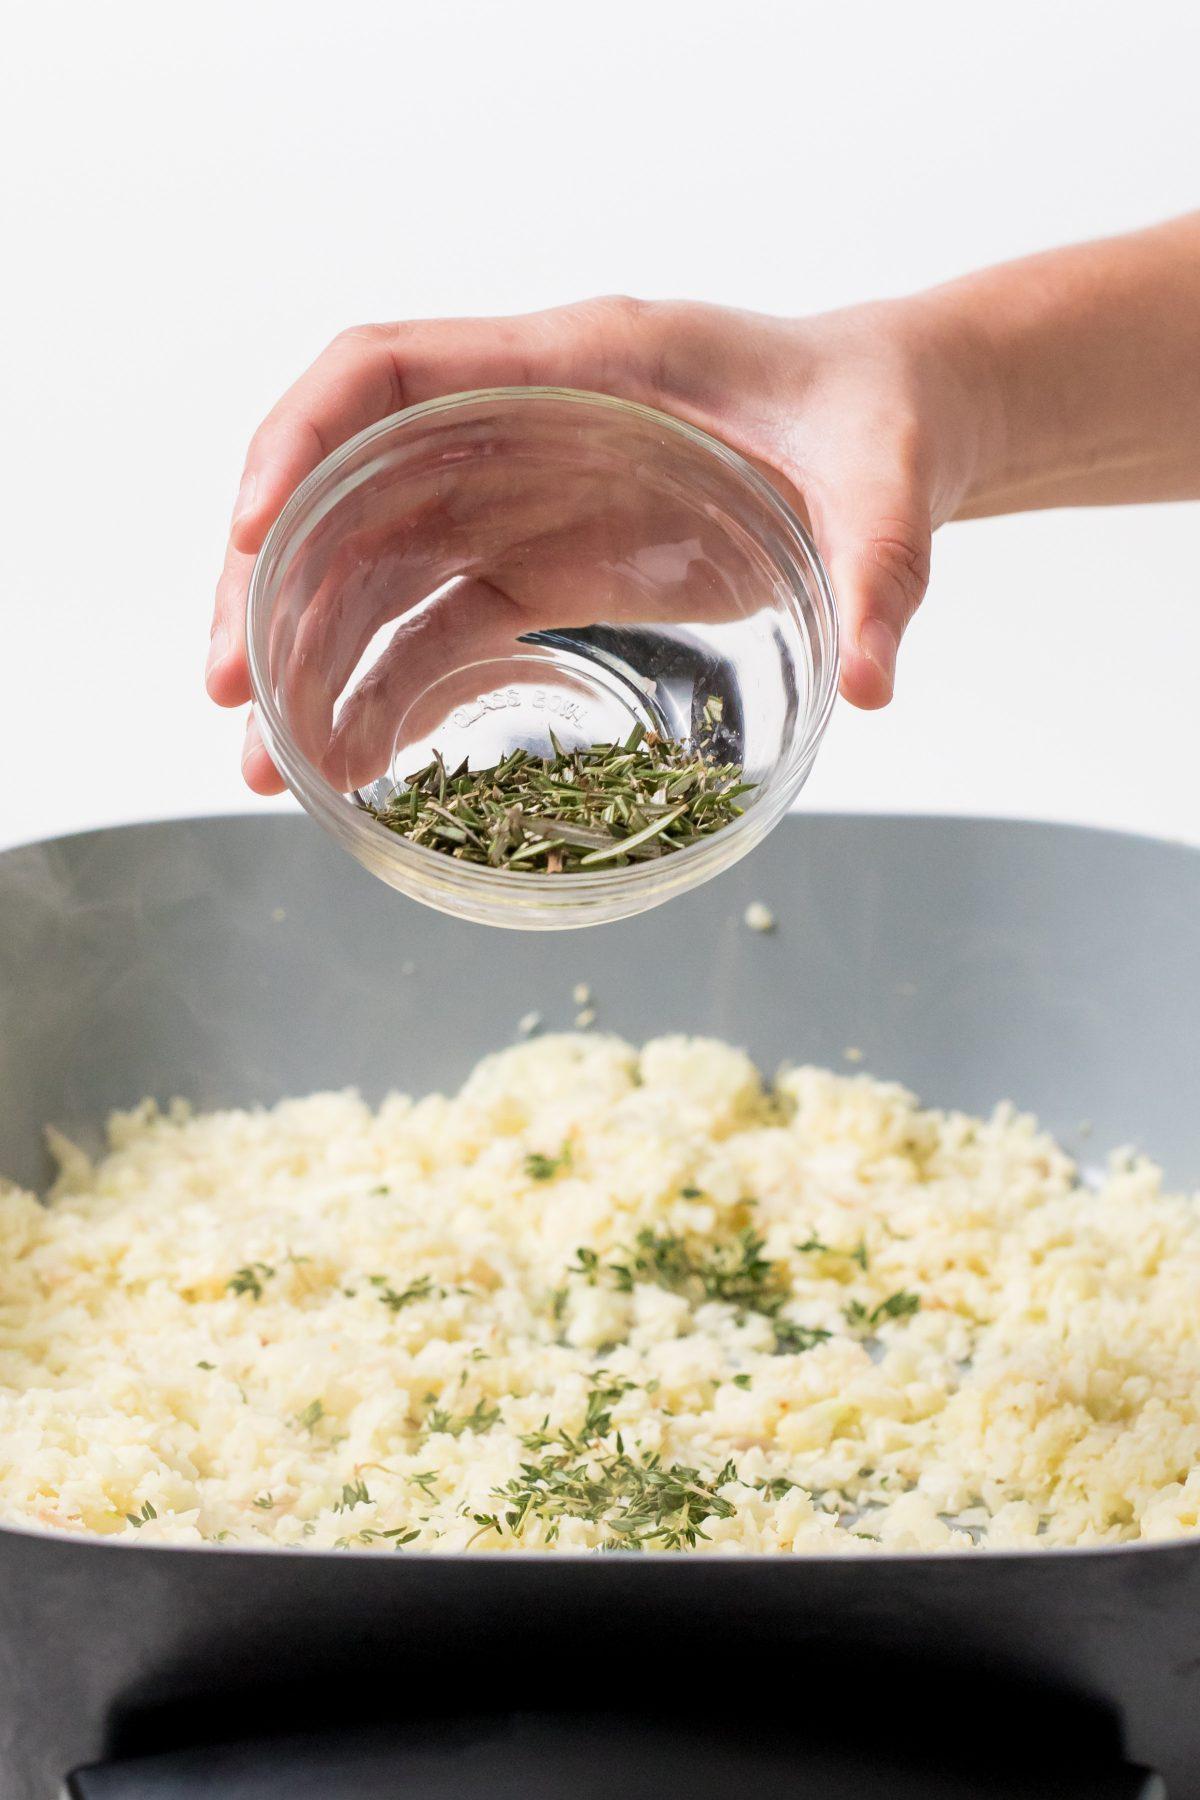 5D4B4143 - Winter Cauliflower Rice Bowls - Cook the riced cauliflower